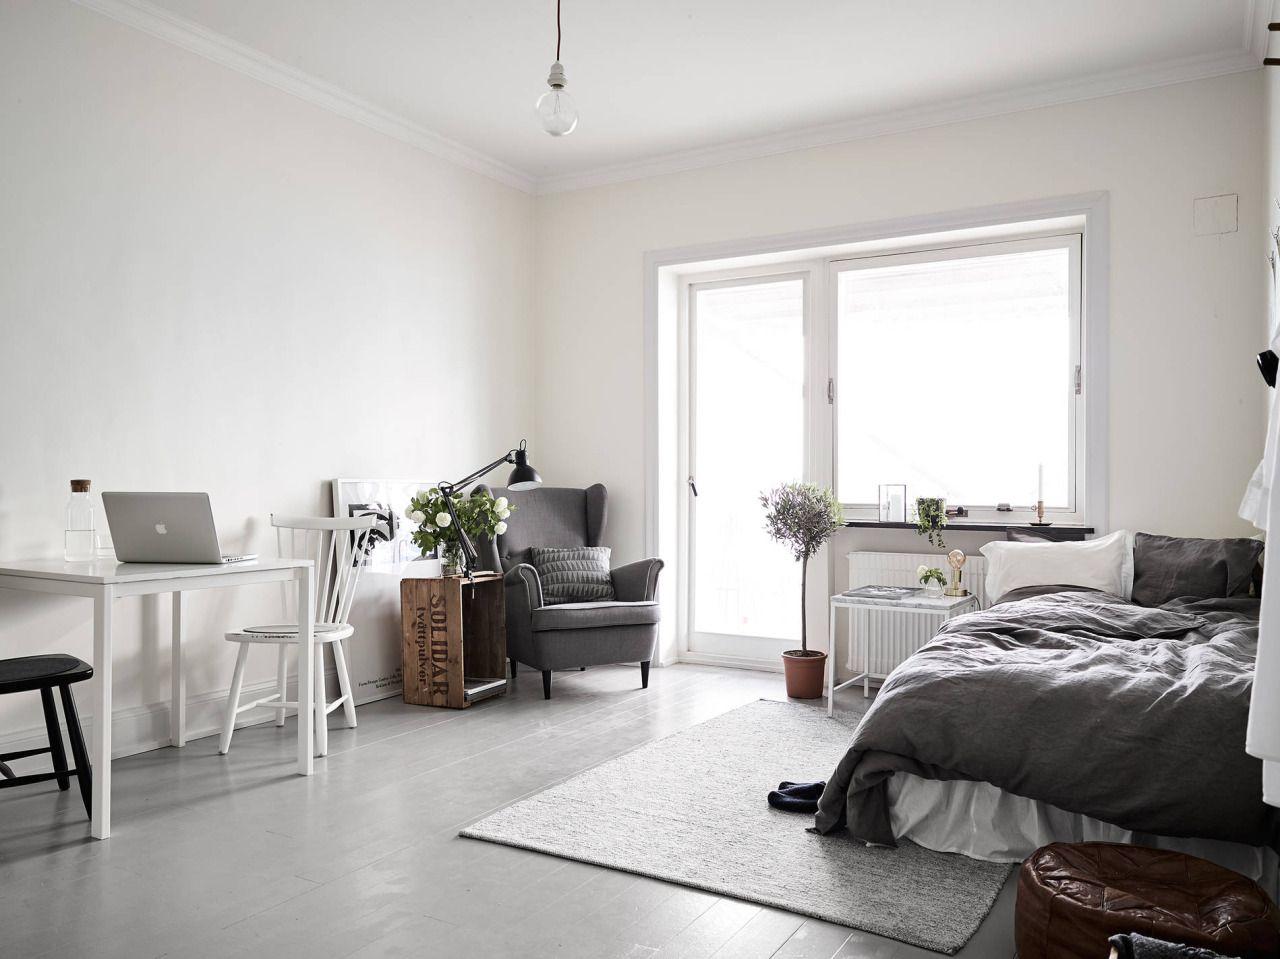 Small studio apartment via Stadshem gravityhomeblog.com - instagram - pinterest - bloglovin